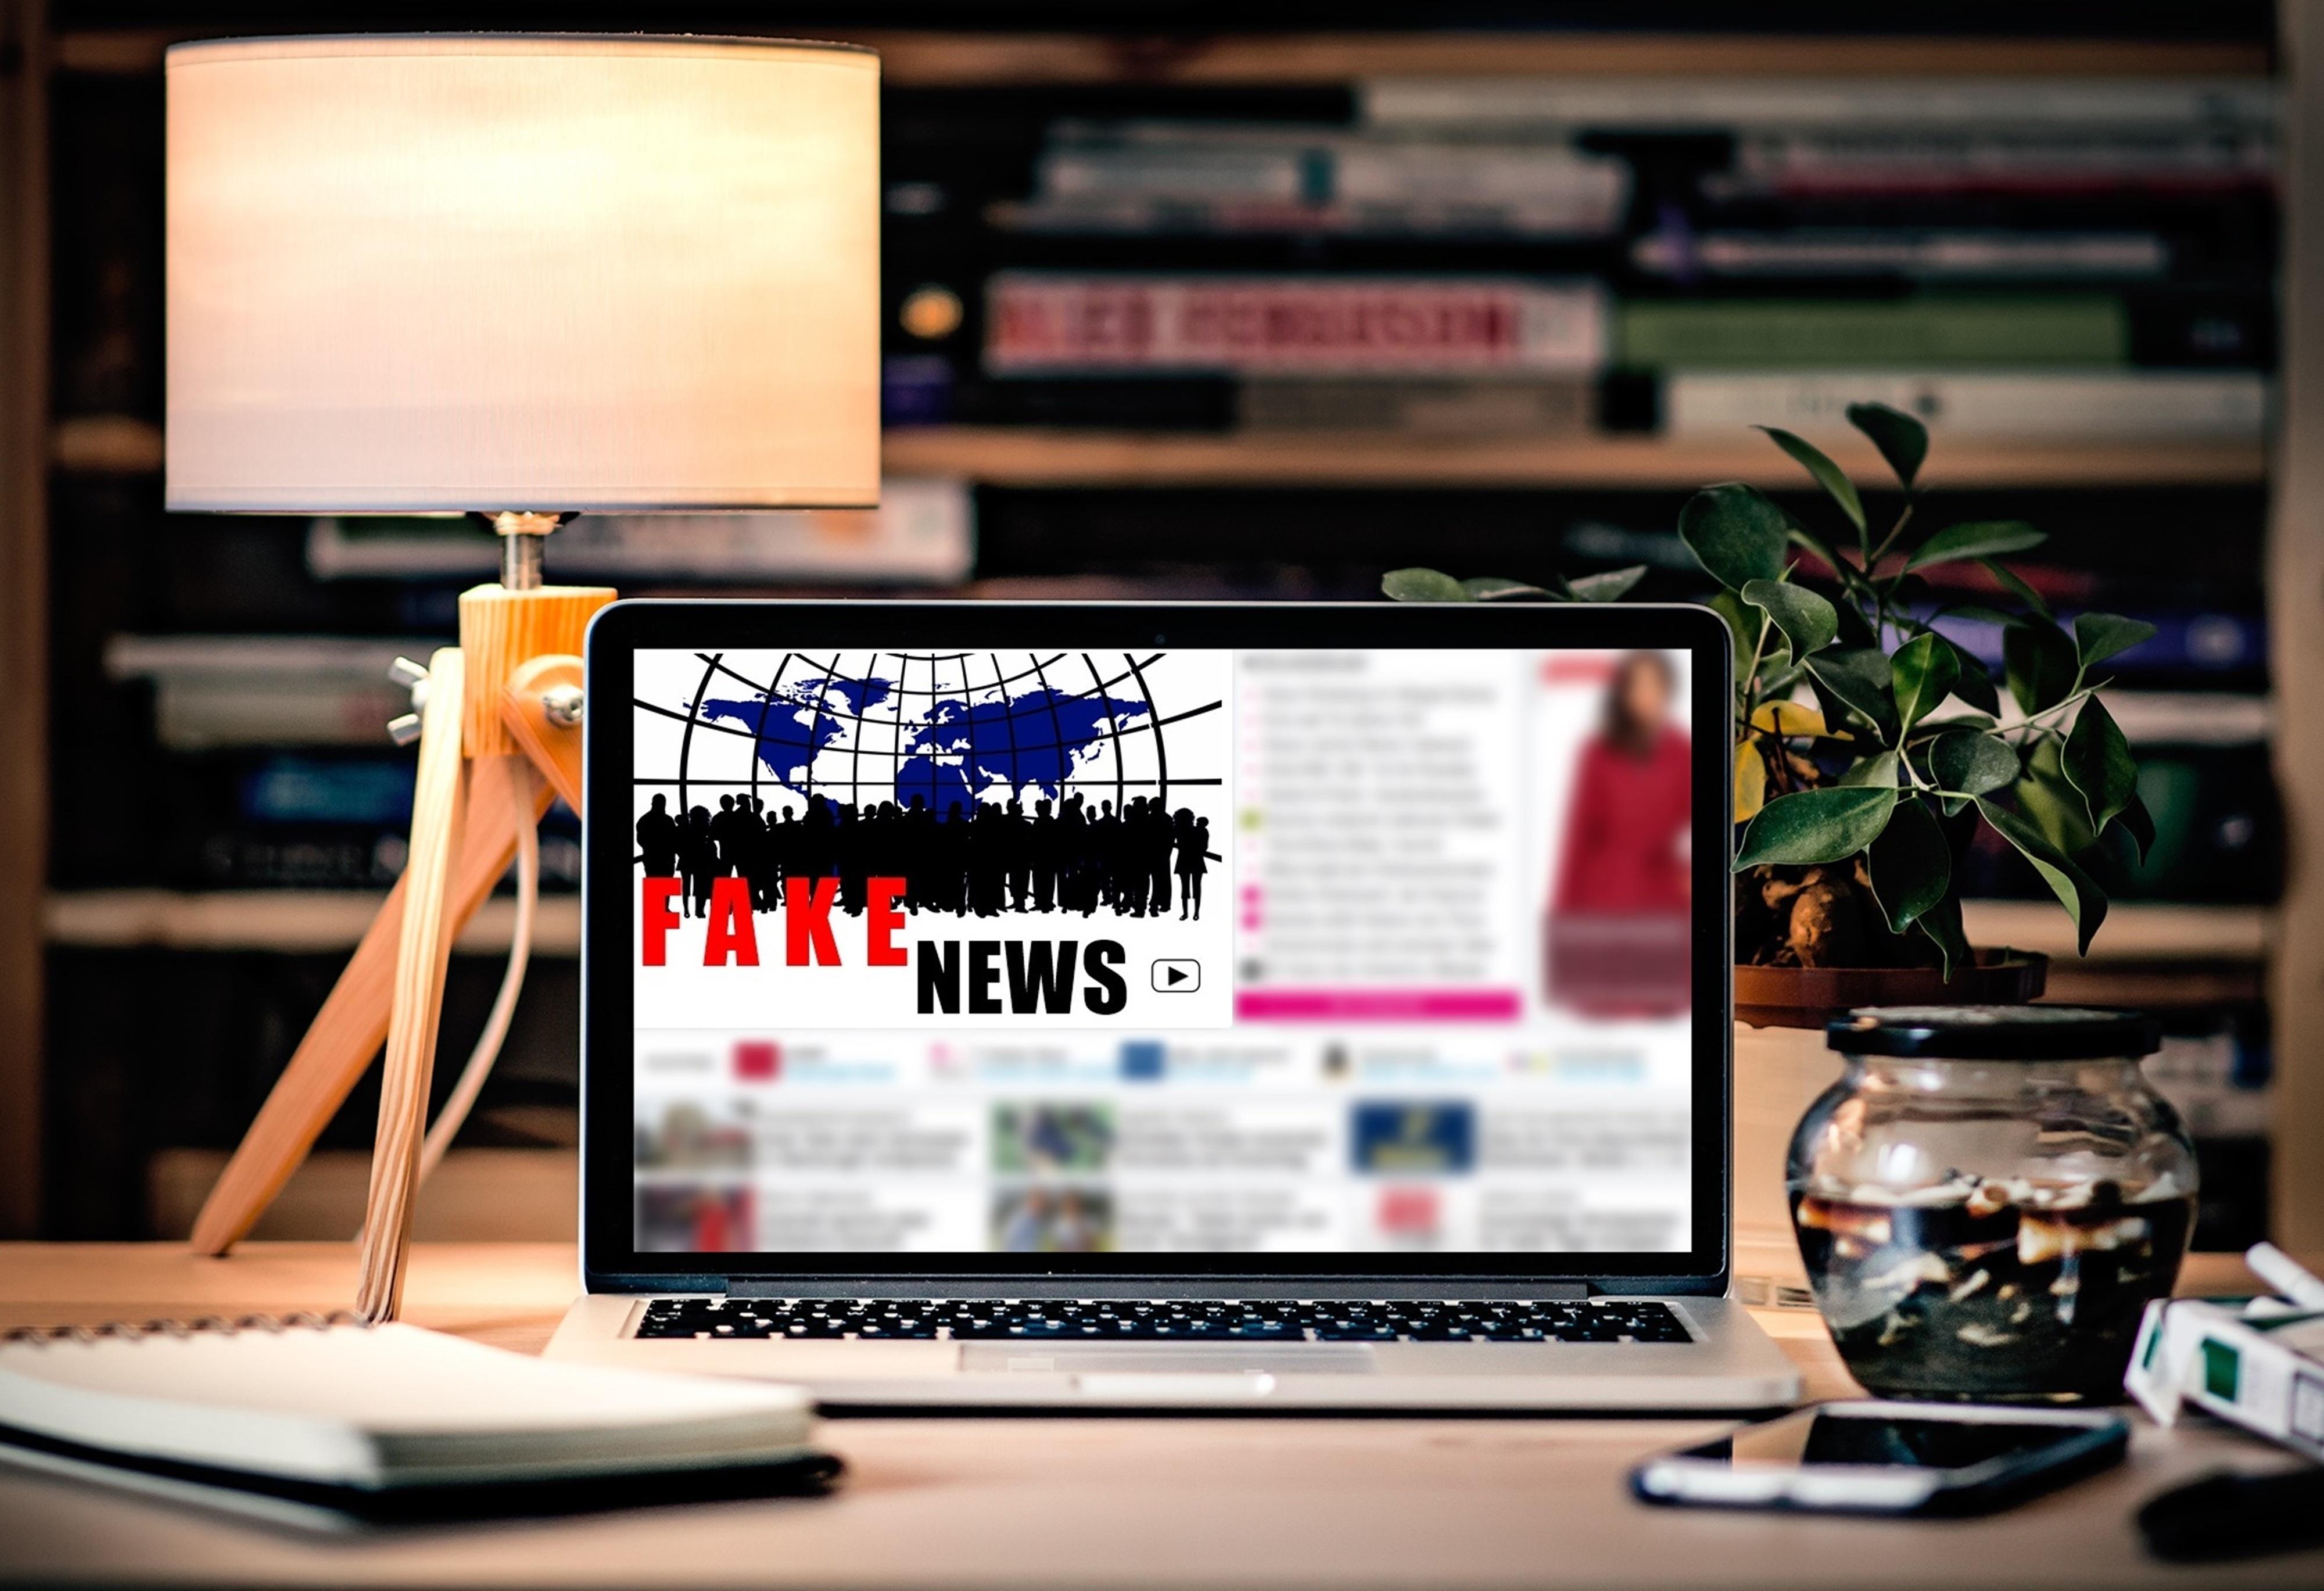 Gambar Laptop Buku Catatan Komputer Mobile Iklan Koran